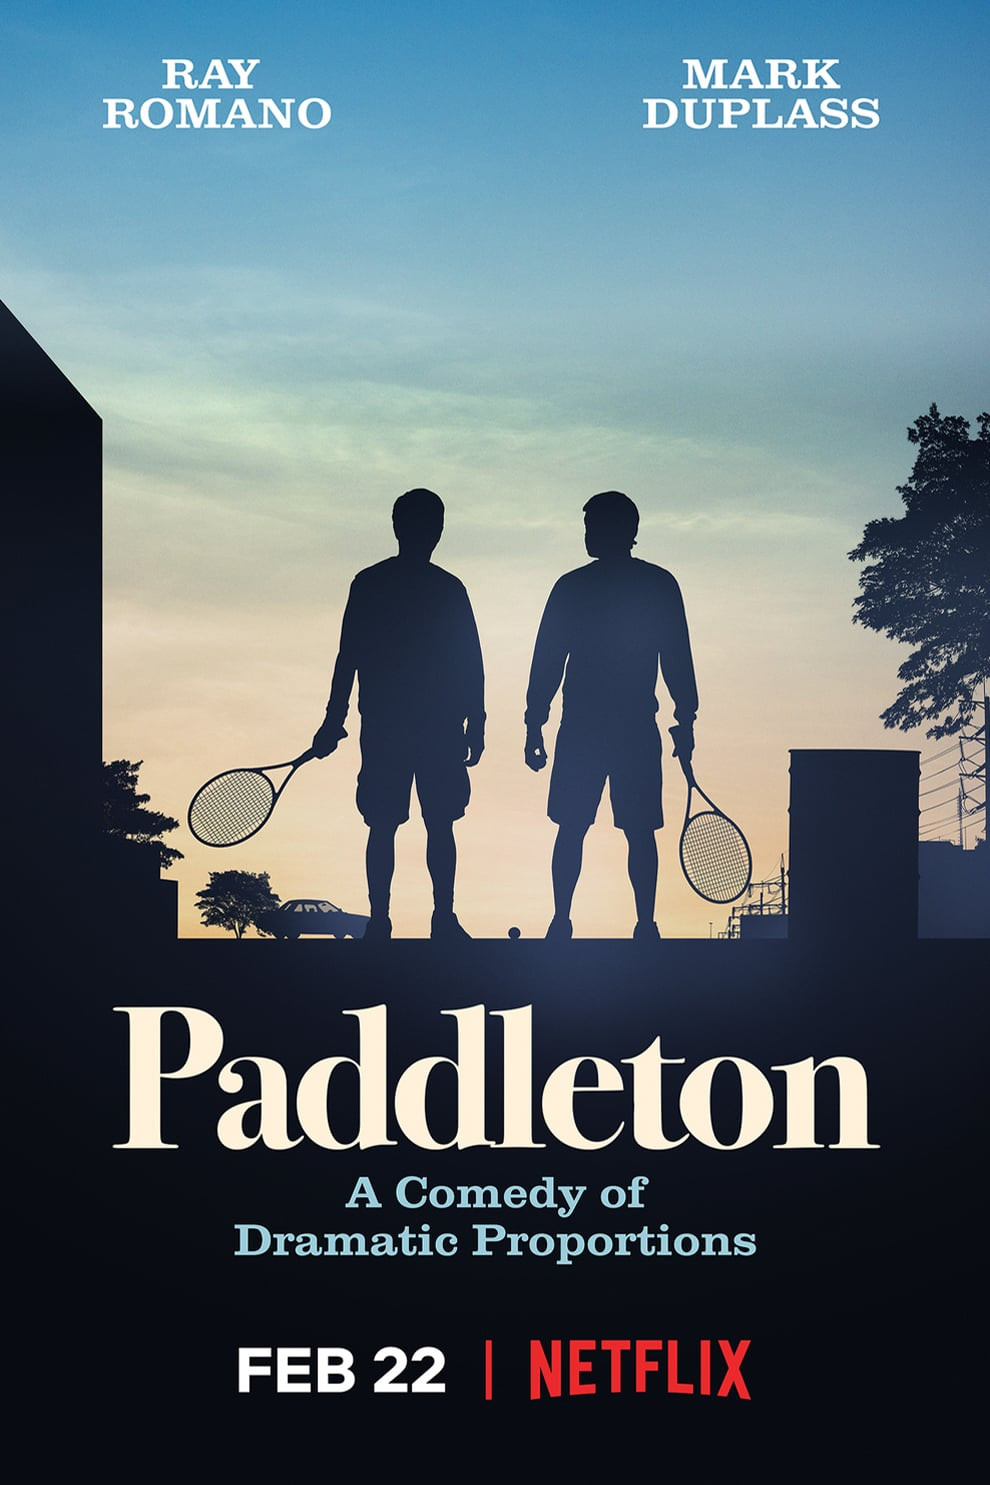 paddleton-poster.jpg